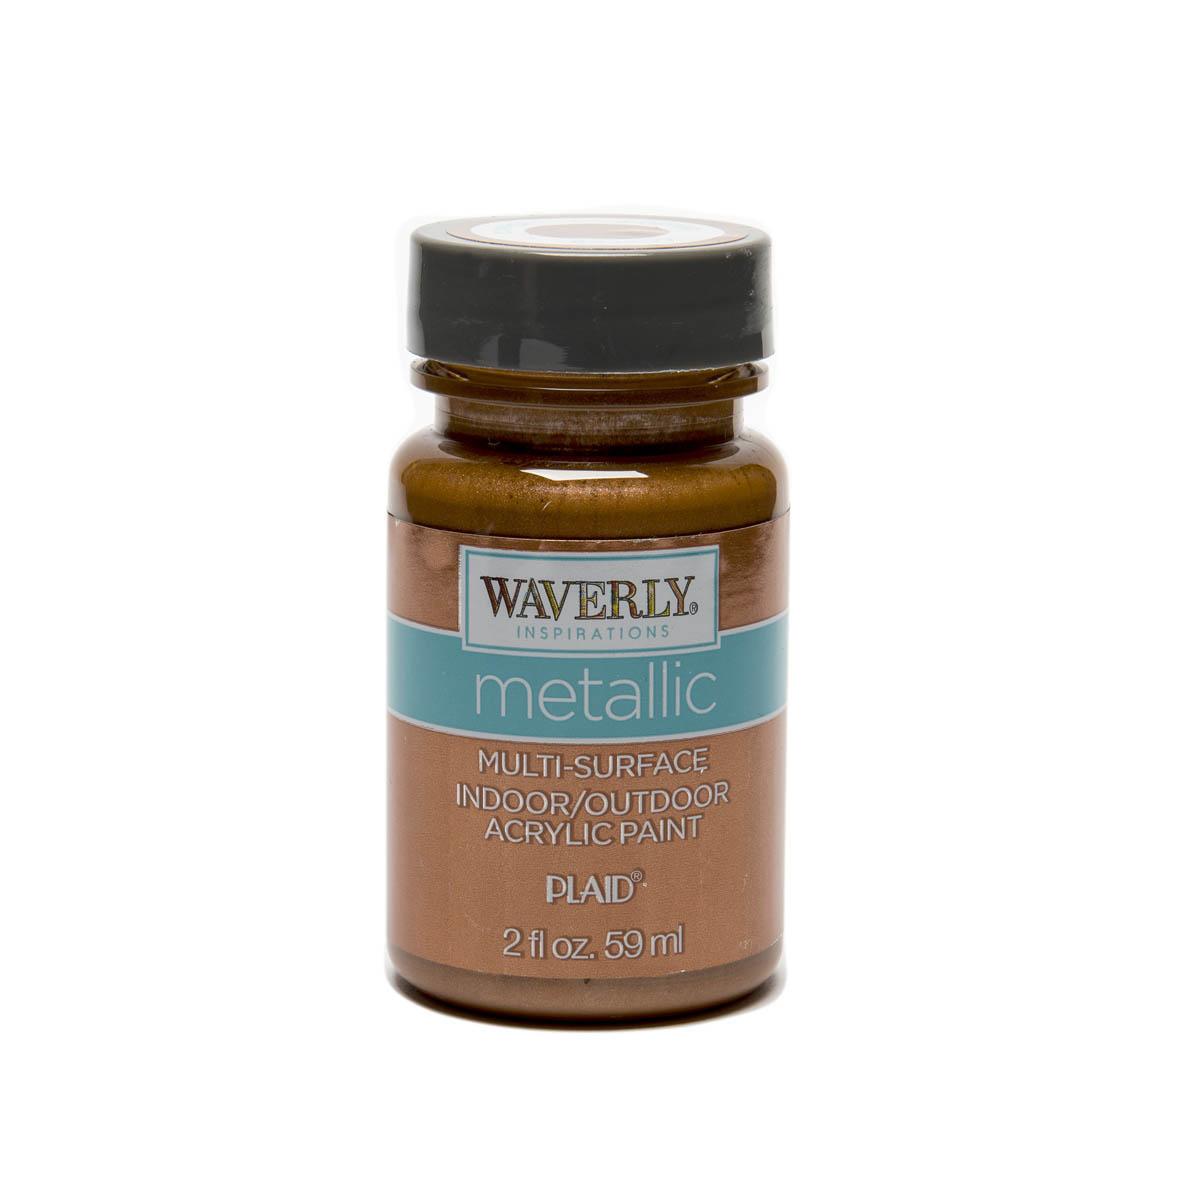 Waverly ® Inspirations Metallic Multi-Surface Acrylic Paint - Copper, 2 oz. - 60691E